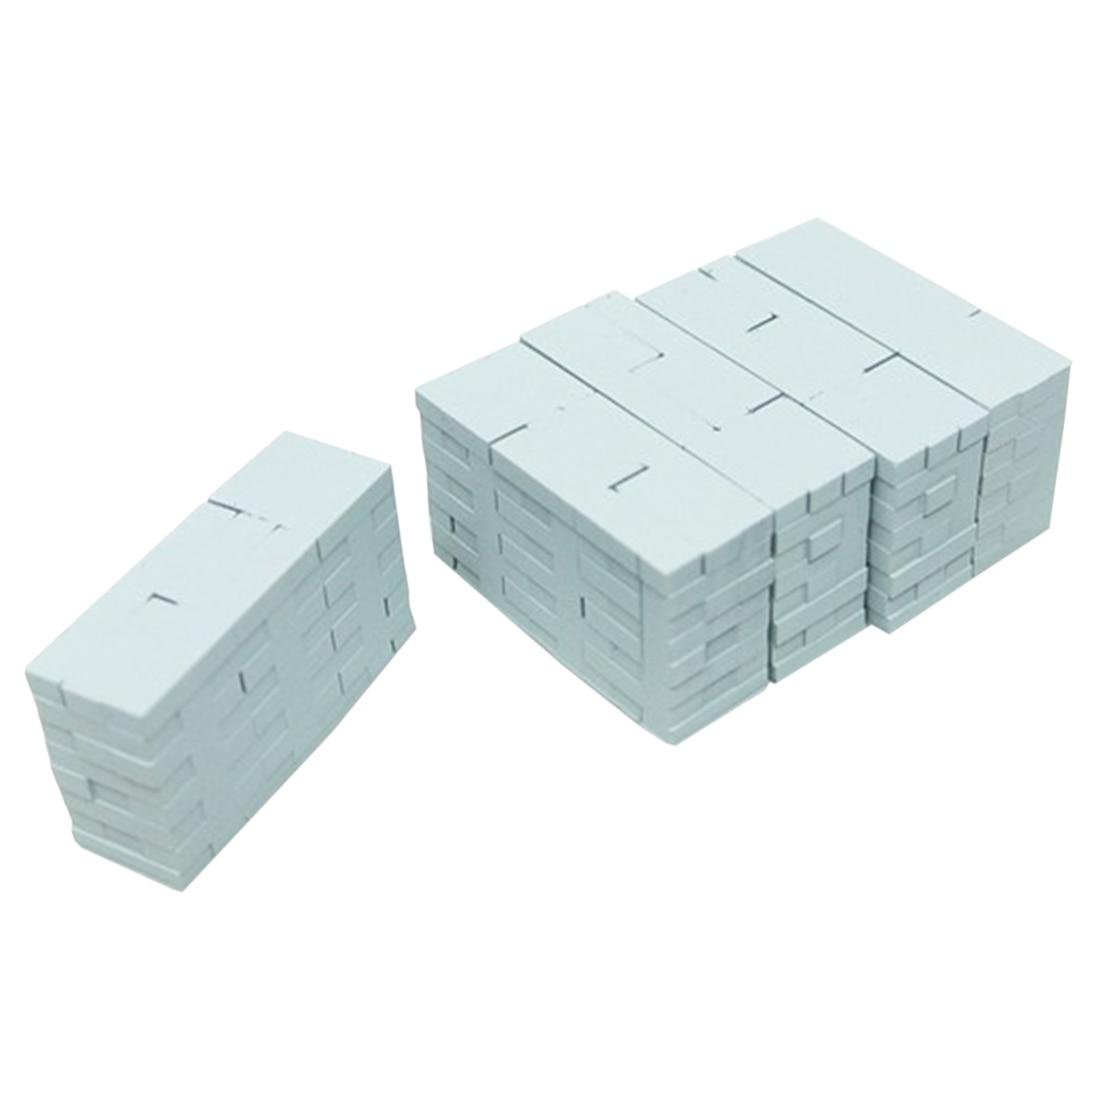 5Pcs/set 1:87 HO Scale Train Model Simulation Train Parts Long/Hollow Bricks DIY Sand Table Building Materials